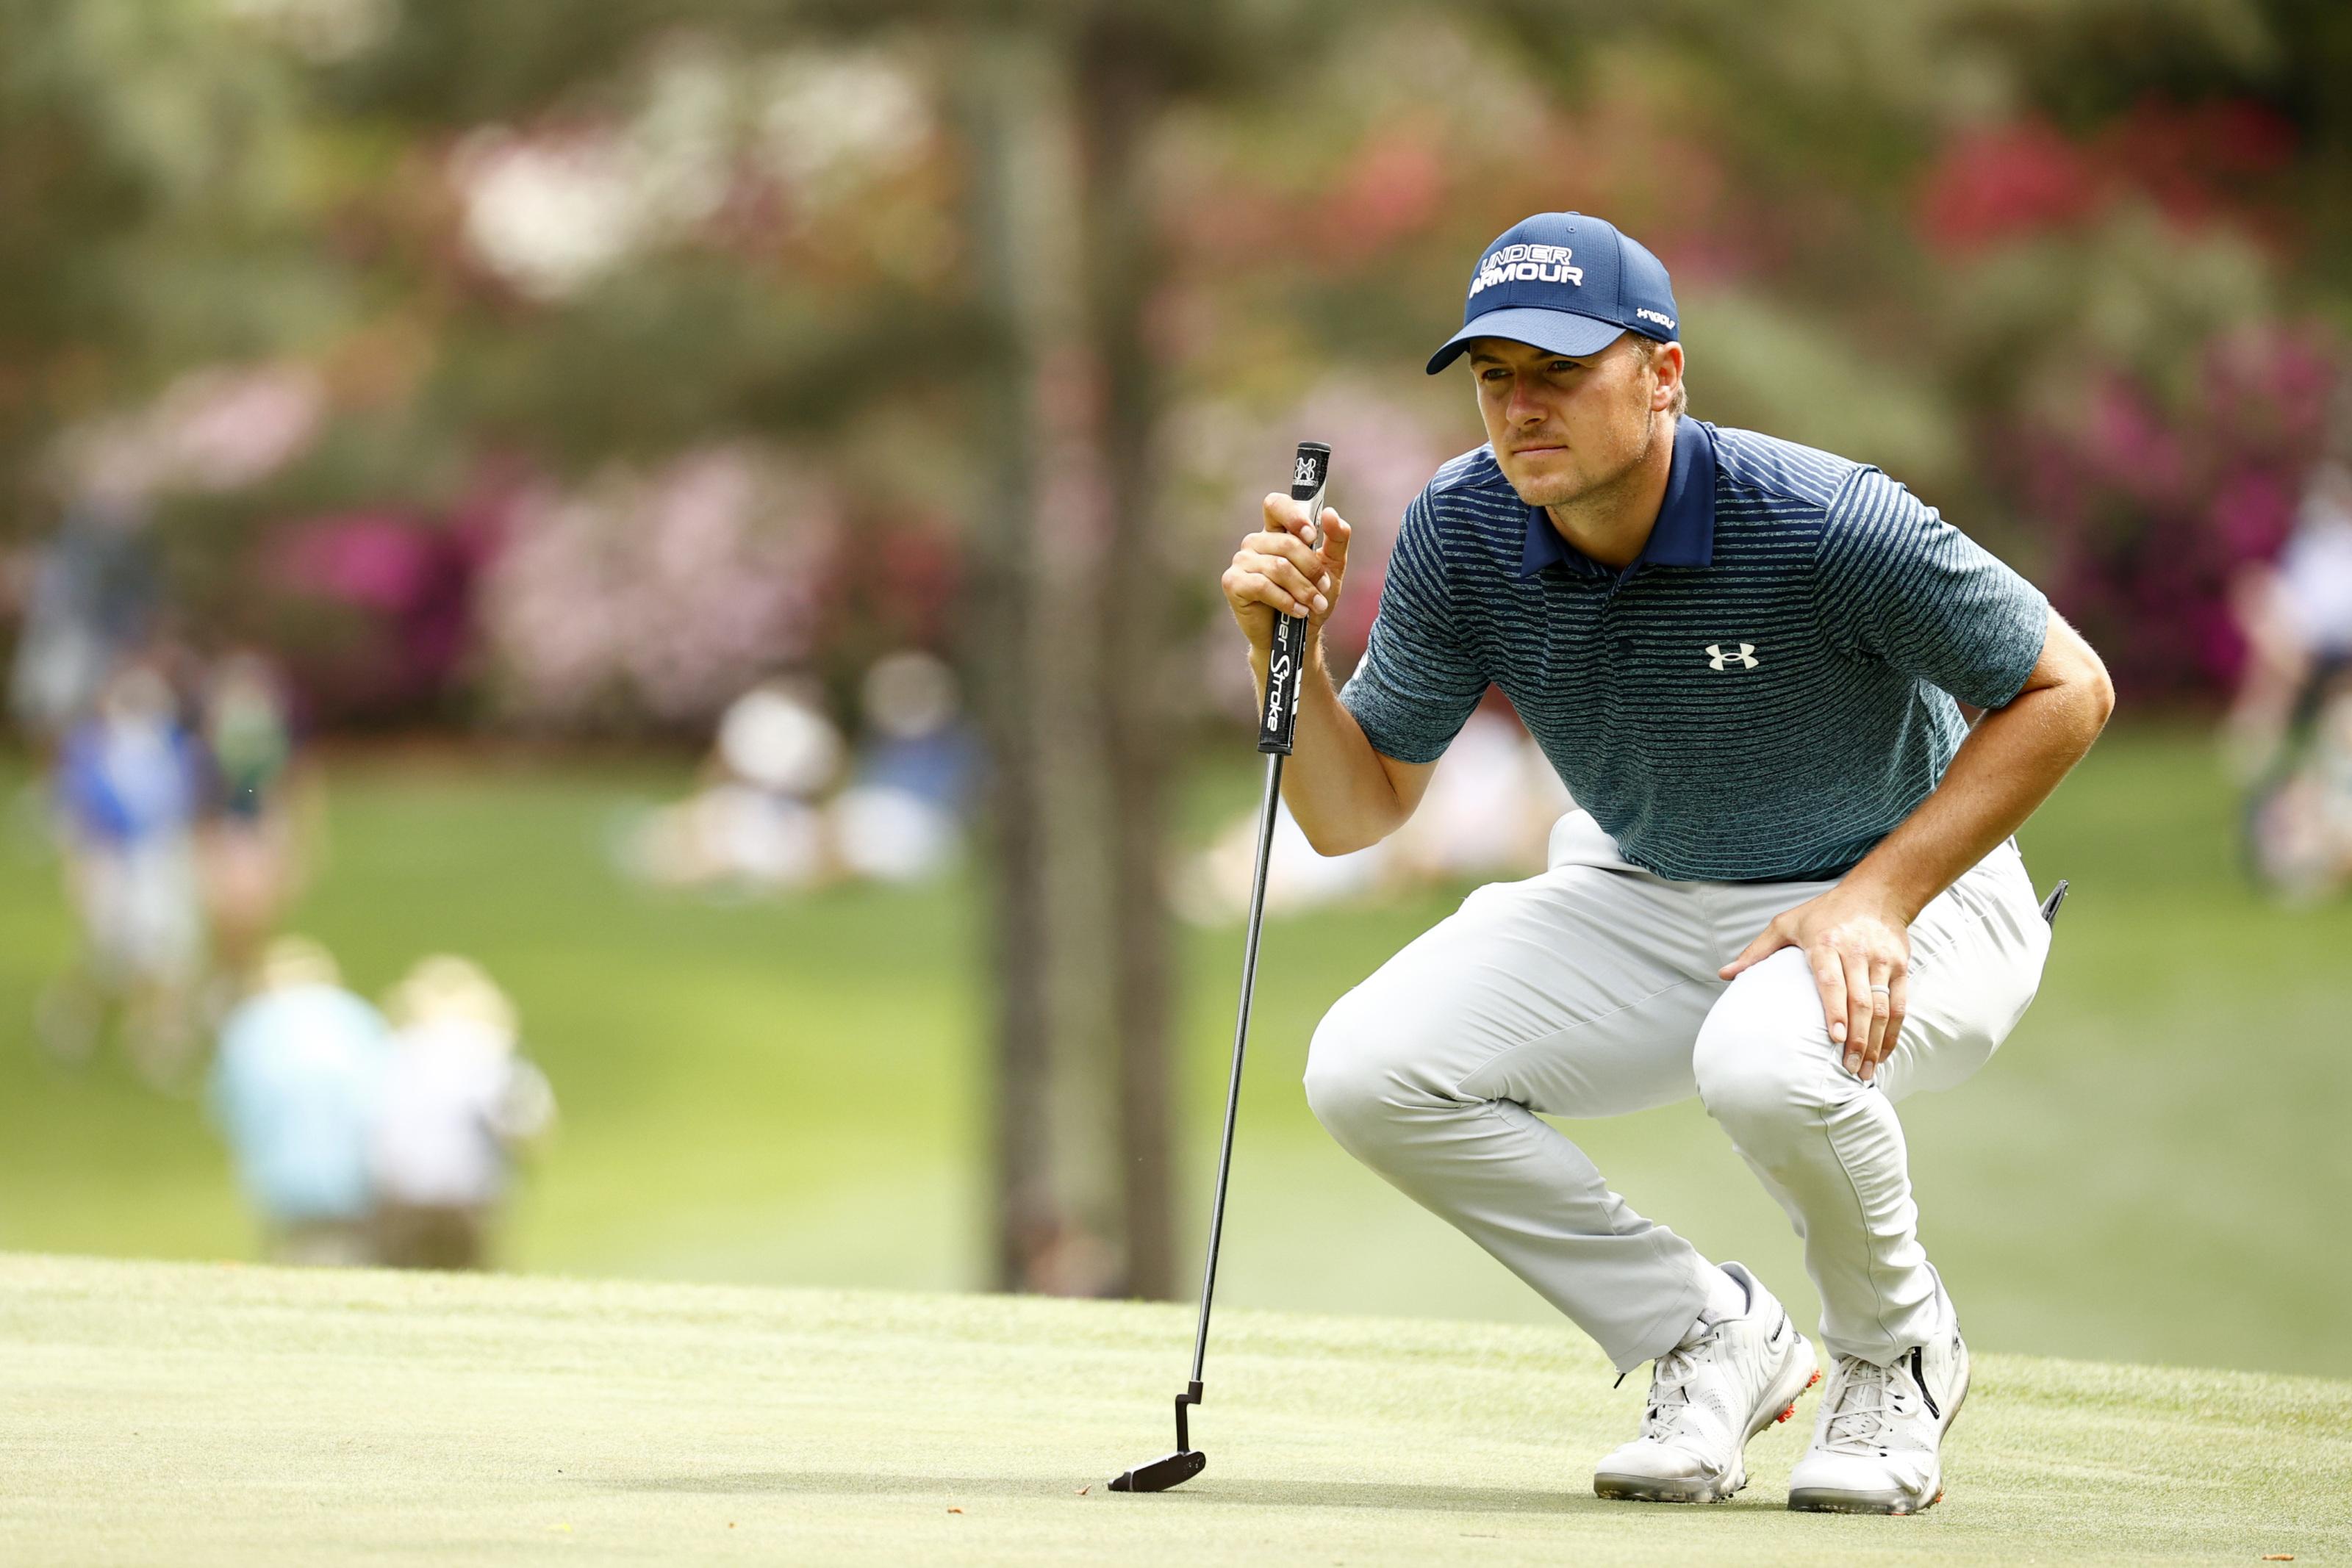 2021 Masters: Jordan Spieth scrambles to save round